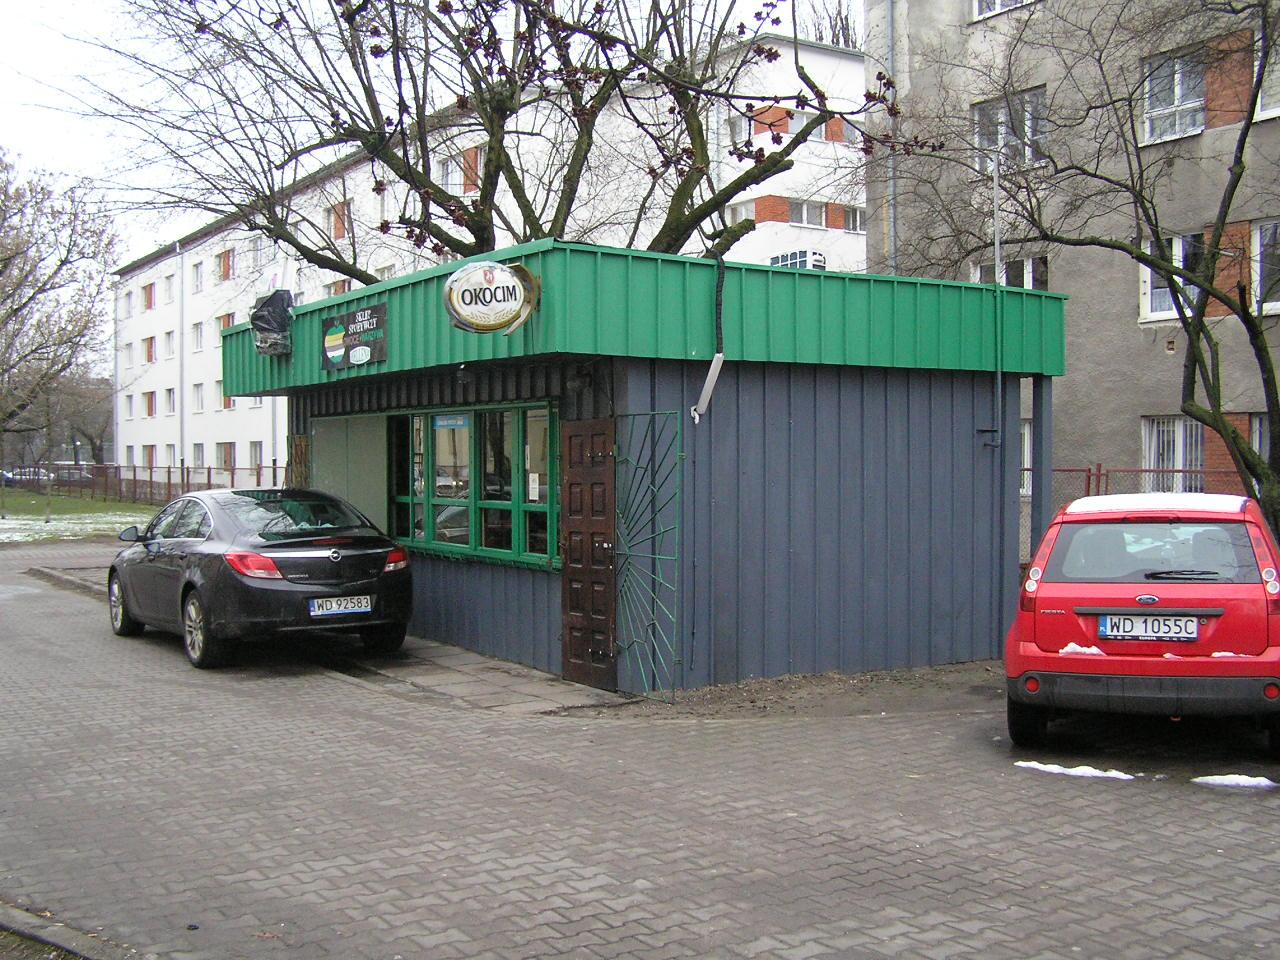 Podskarbińska 5